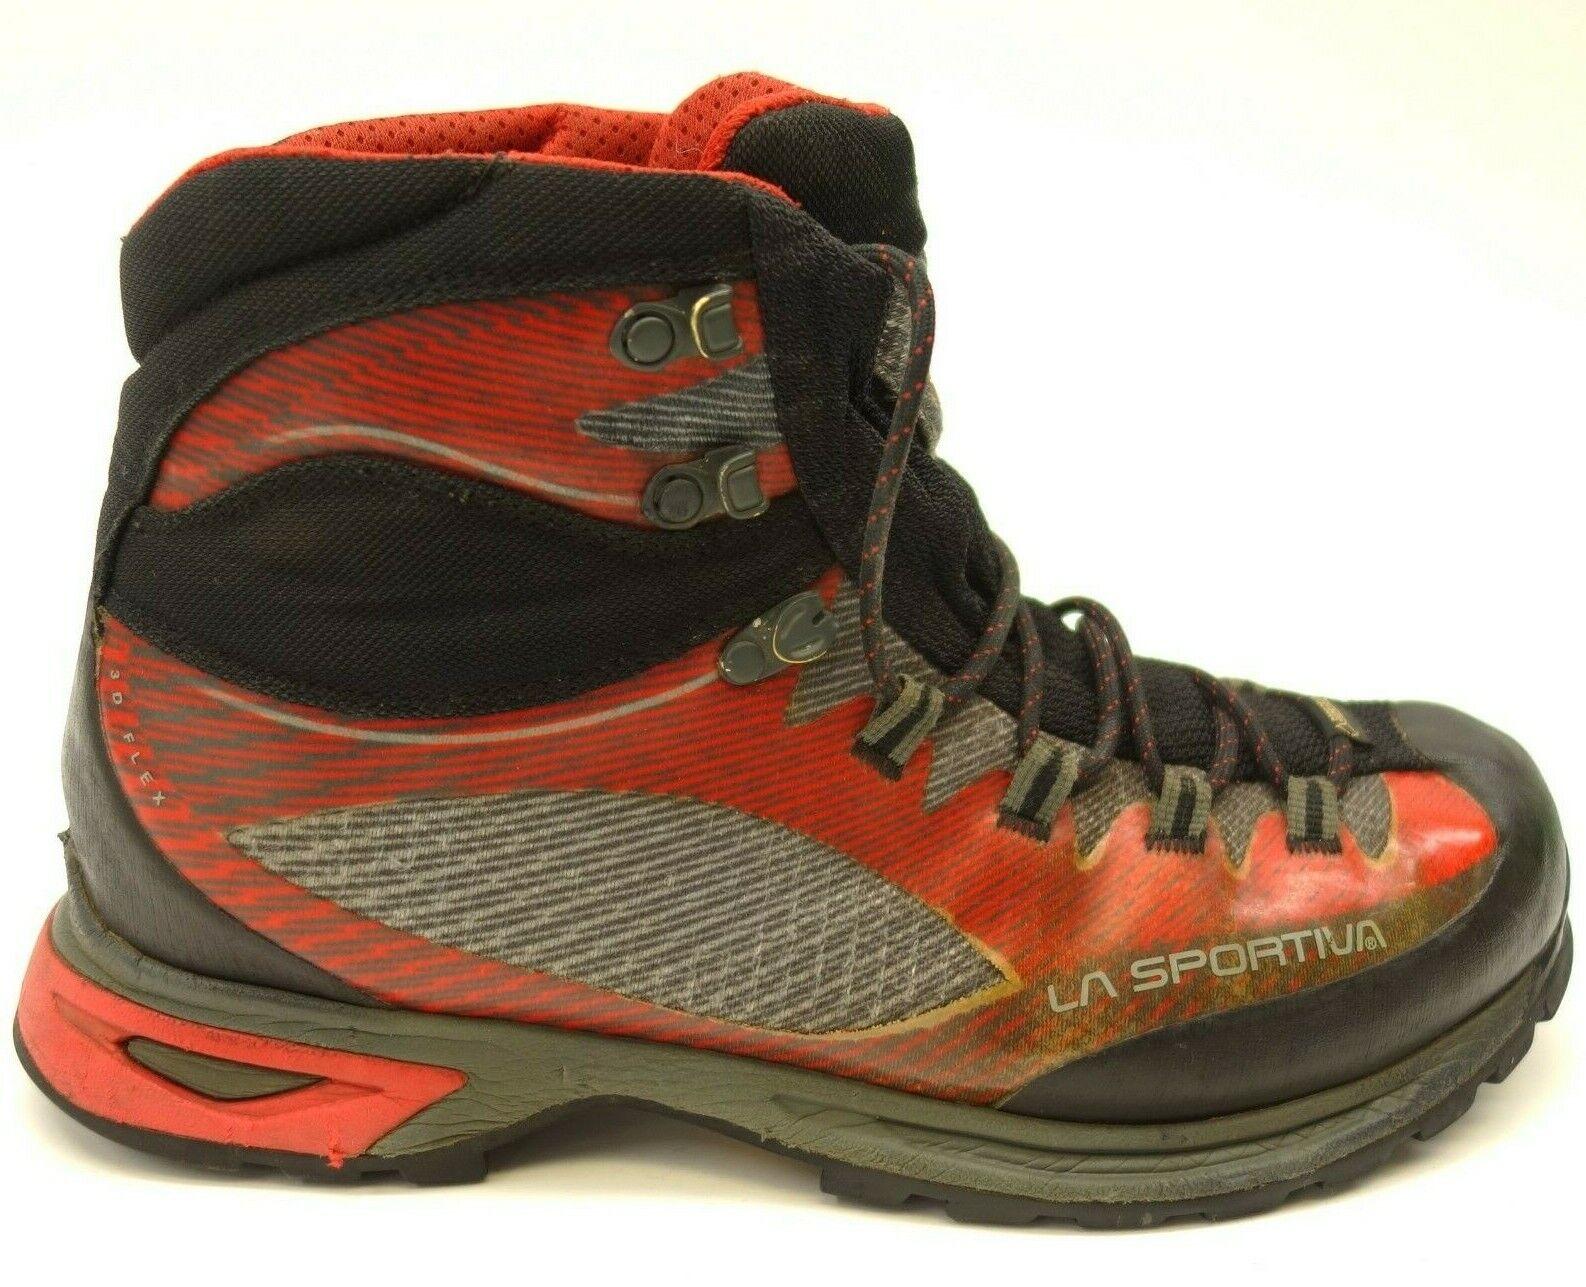 La Sportiva Trango TRK GTX Sz 9.5 Red Athletic Hiking Mens Boots